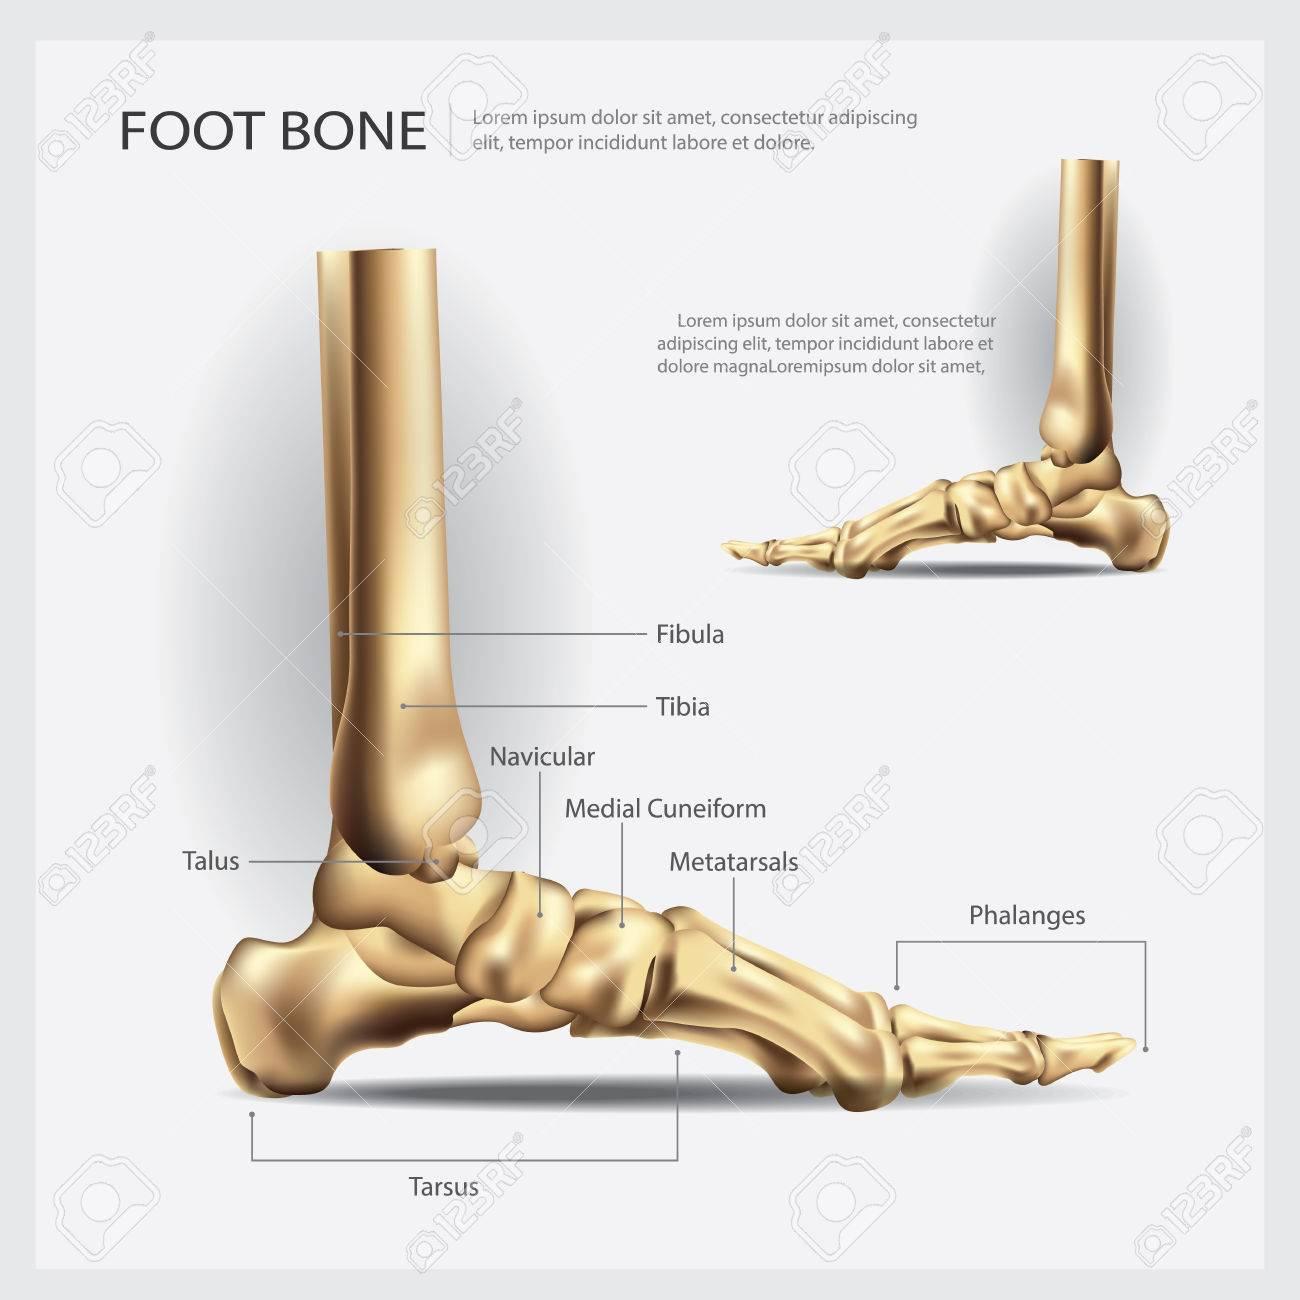 Fuß Knochen Vektor-Illustration Lizenzfrei Nutzbare Vektorgrafiken ...